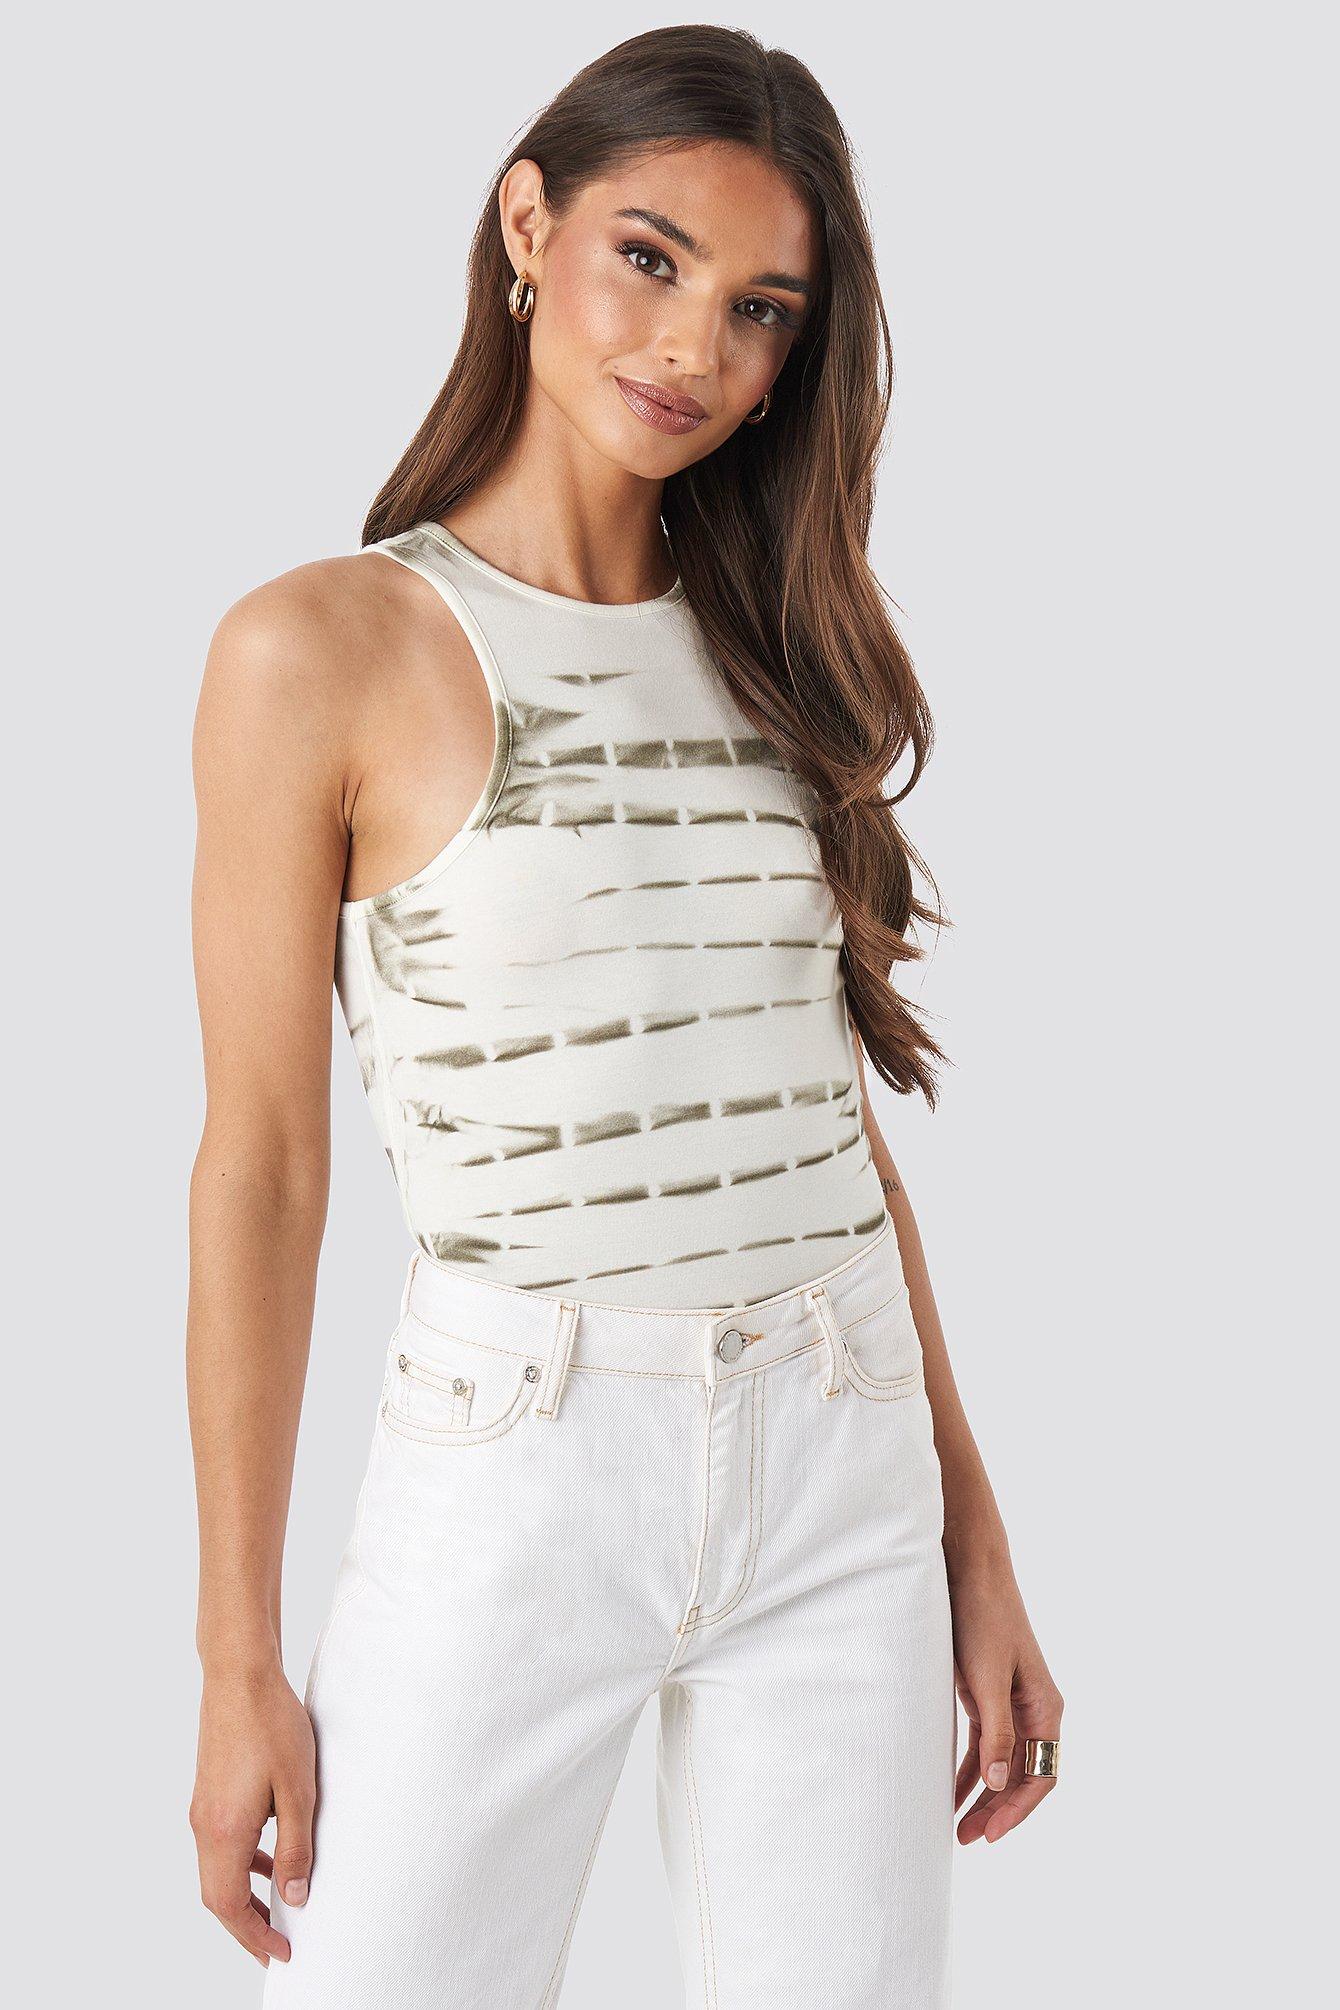 na-kd trend -  Tie Dye Tank Top - White,Multicolor